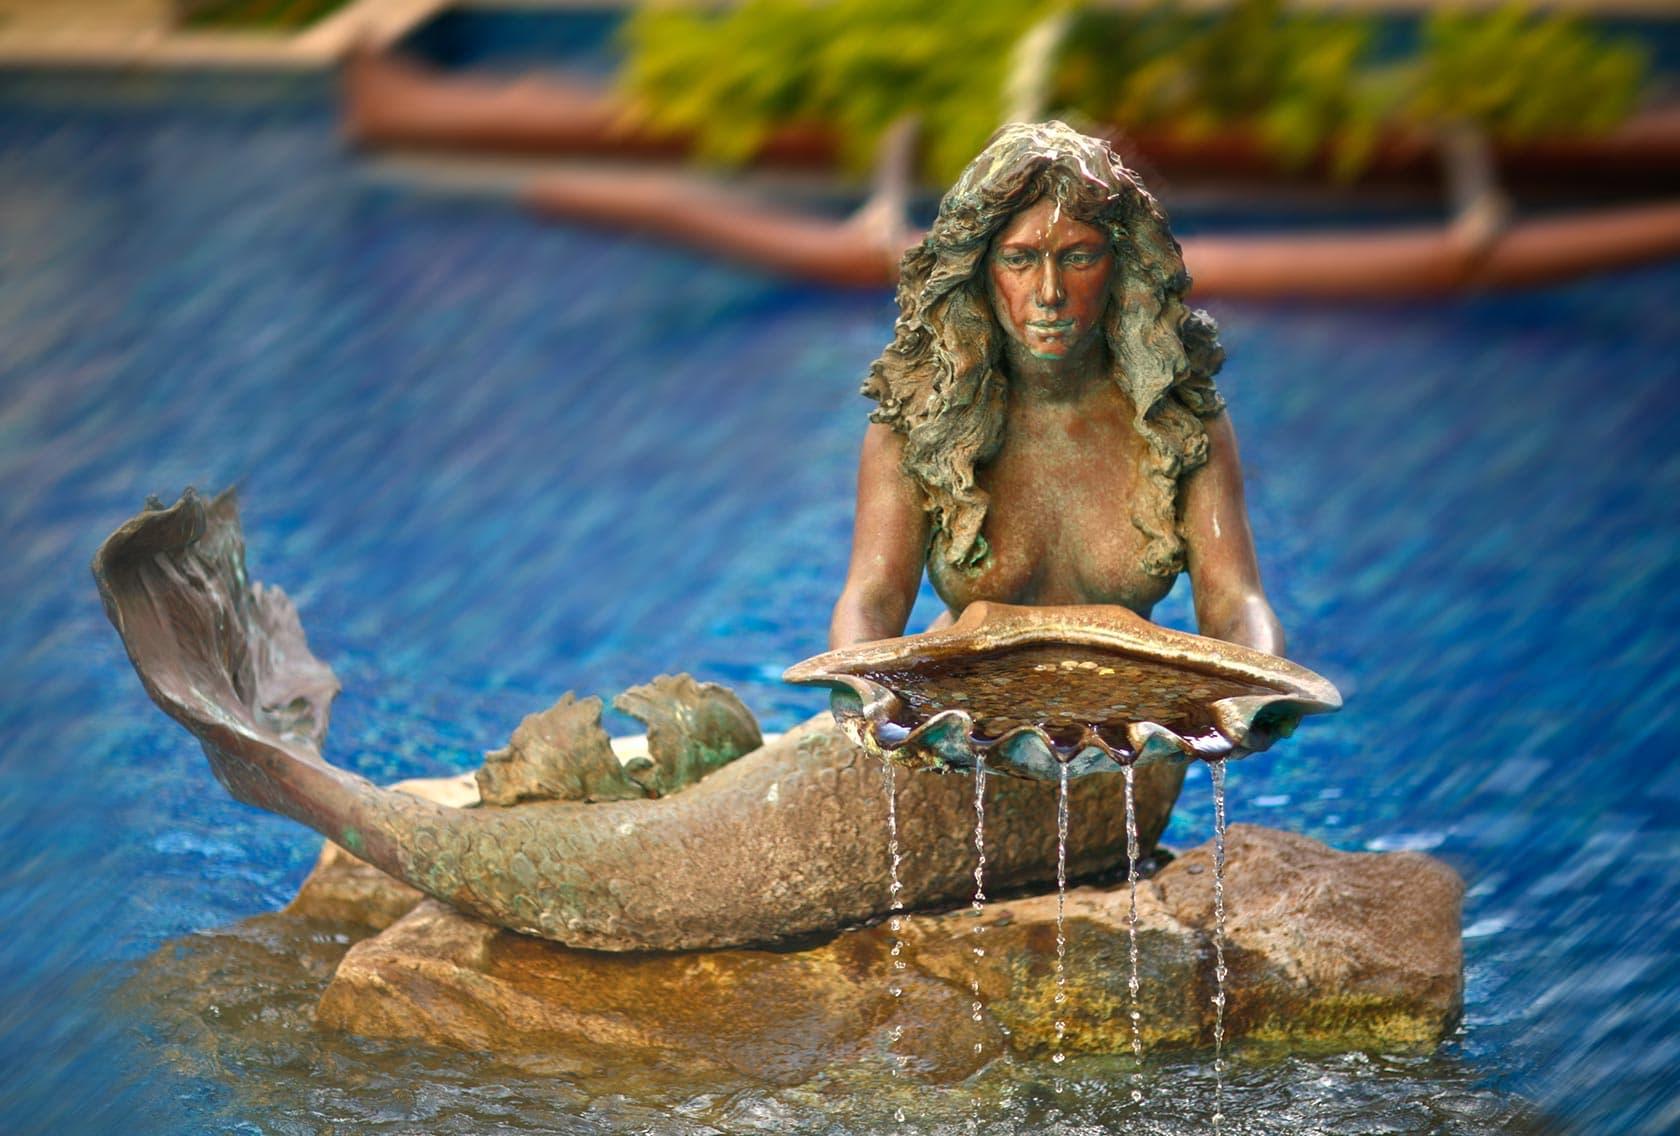 mermaid-sculpture-fountain-pool-1680x1136.jpg